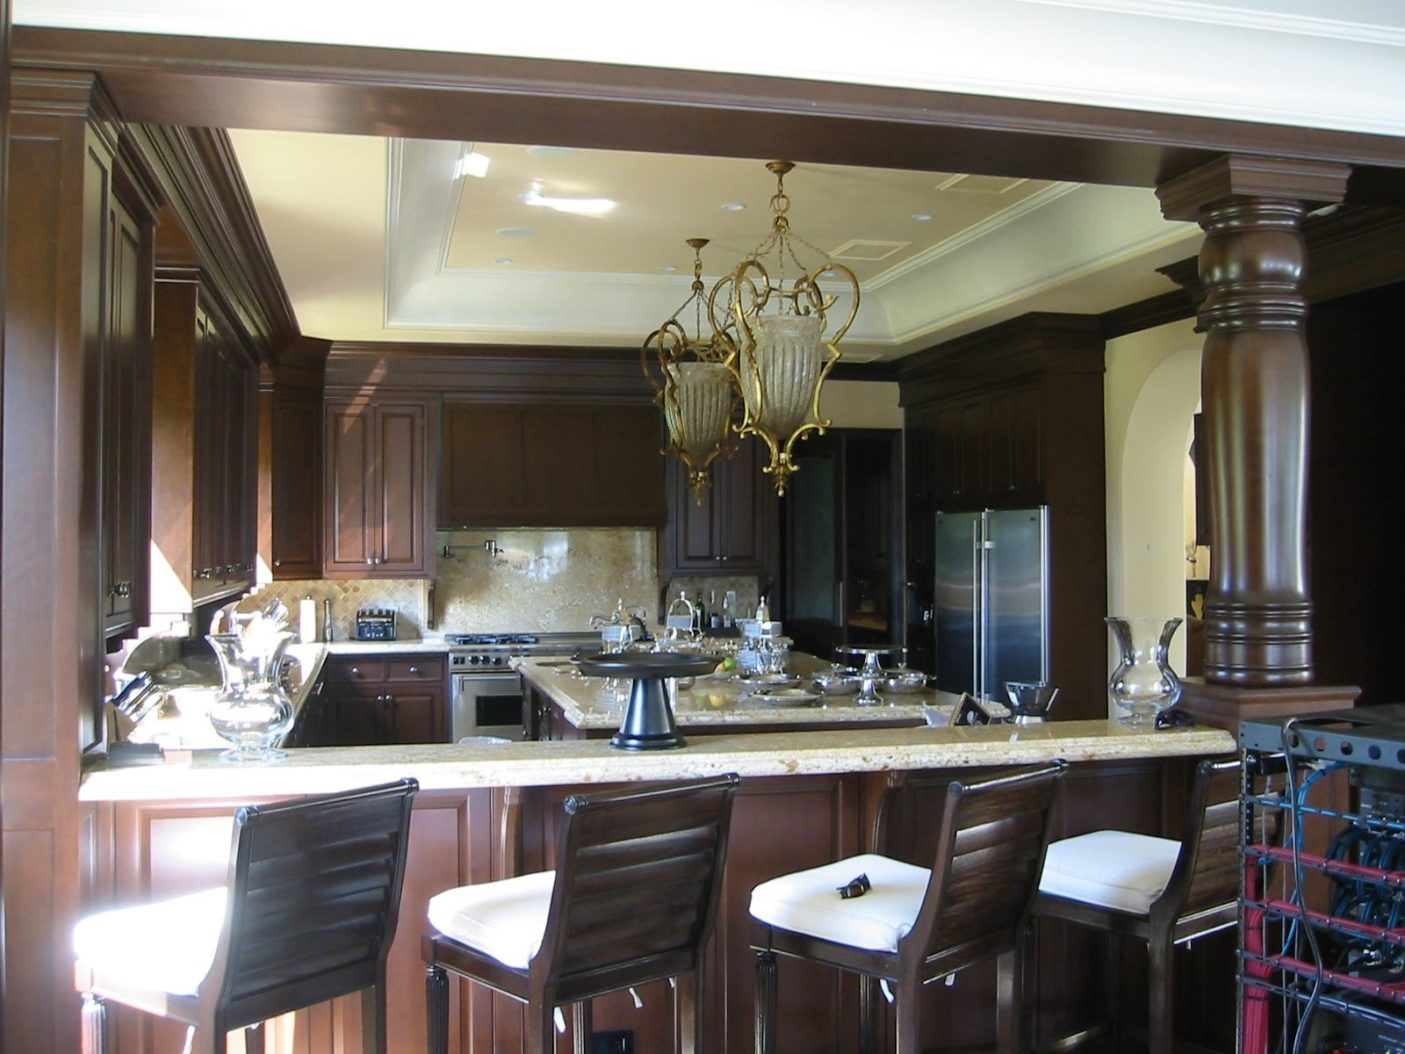 Kitchens-169.jpg